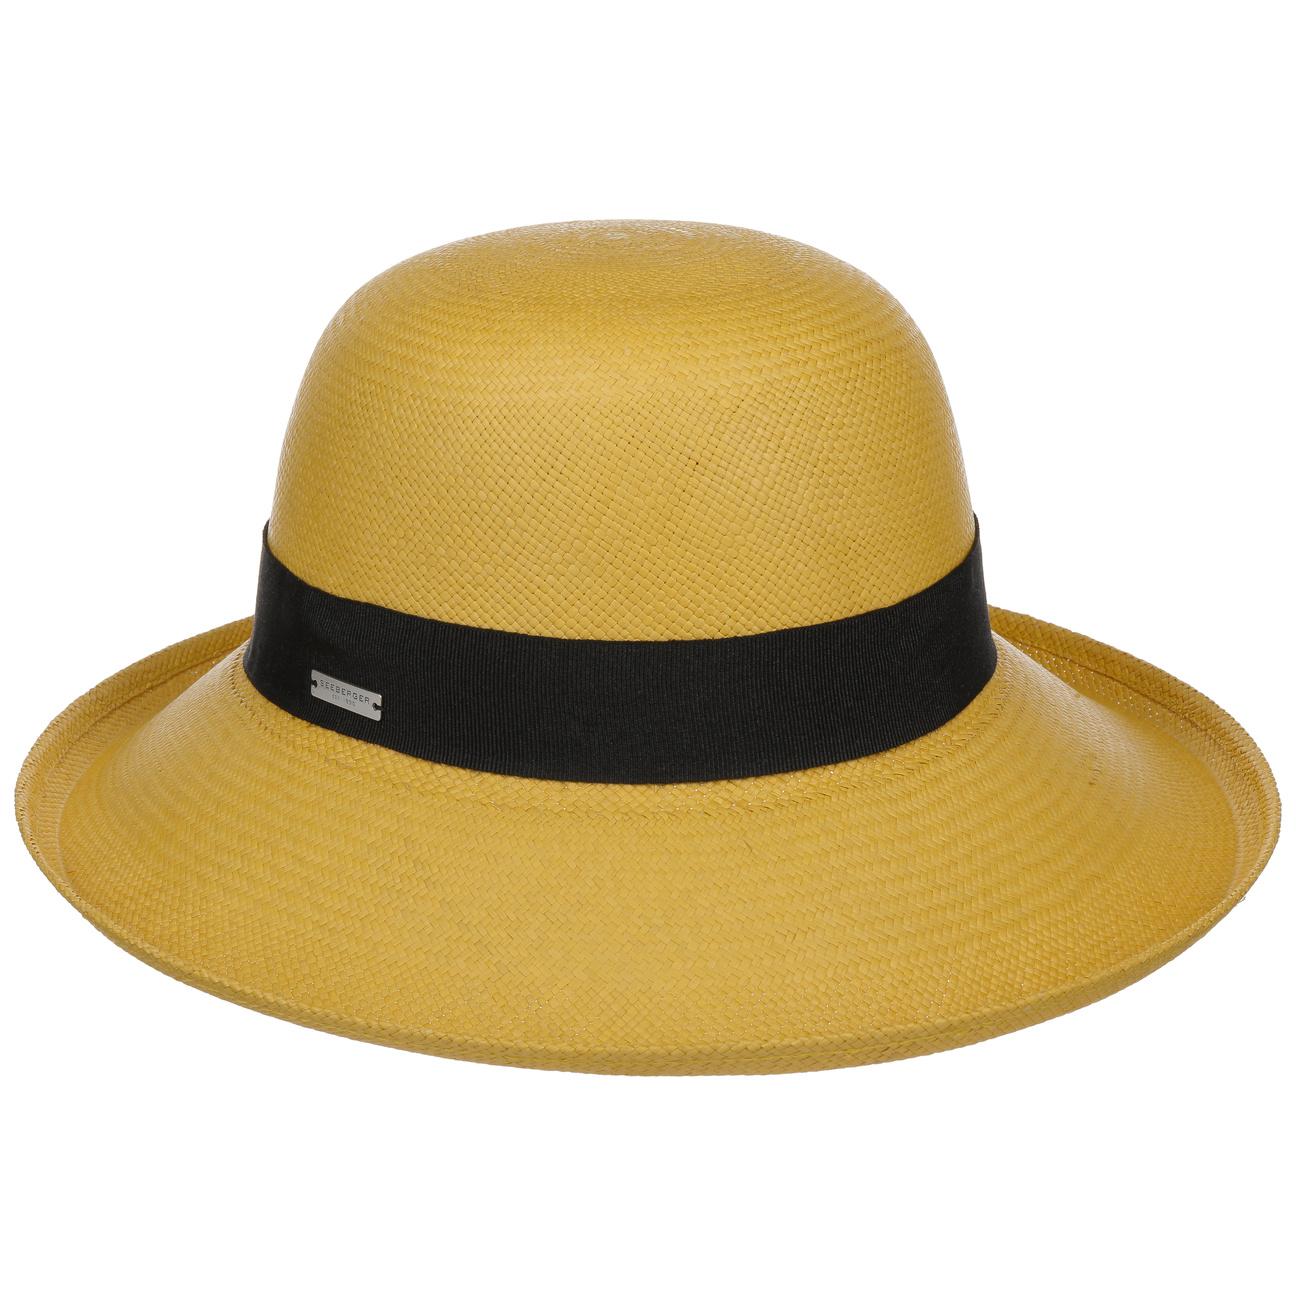 Chapeau Panama Disuna by Seeberger  chapeau en paille de panama